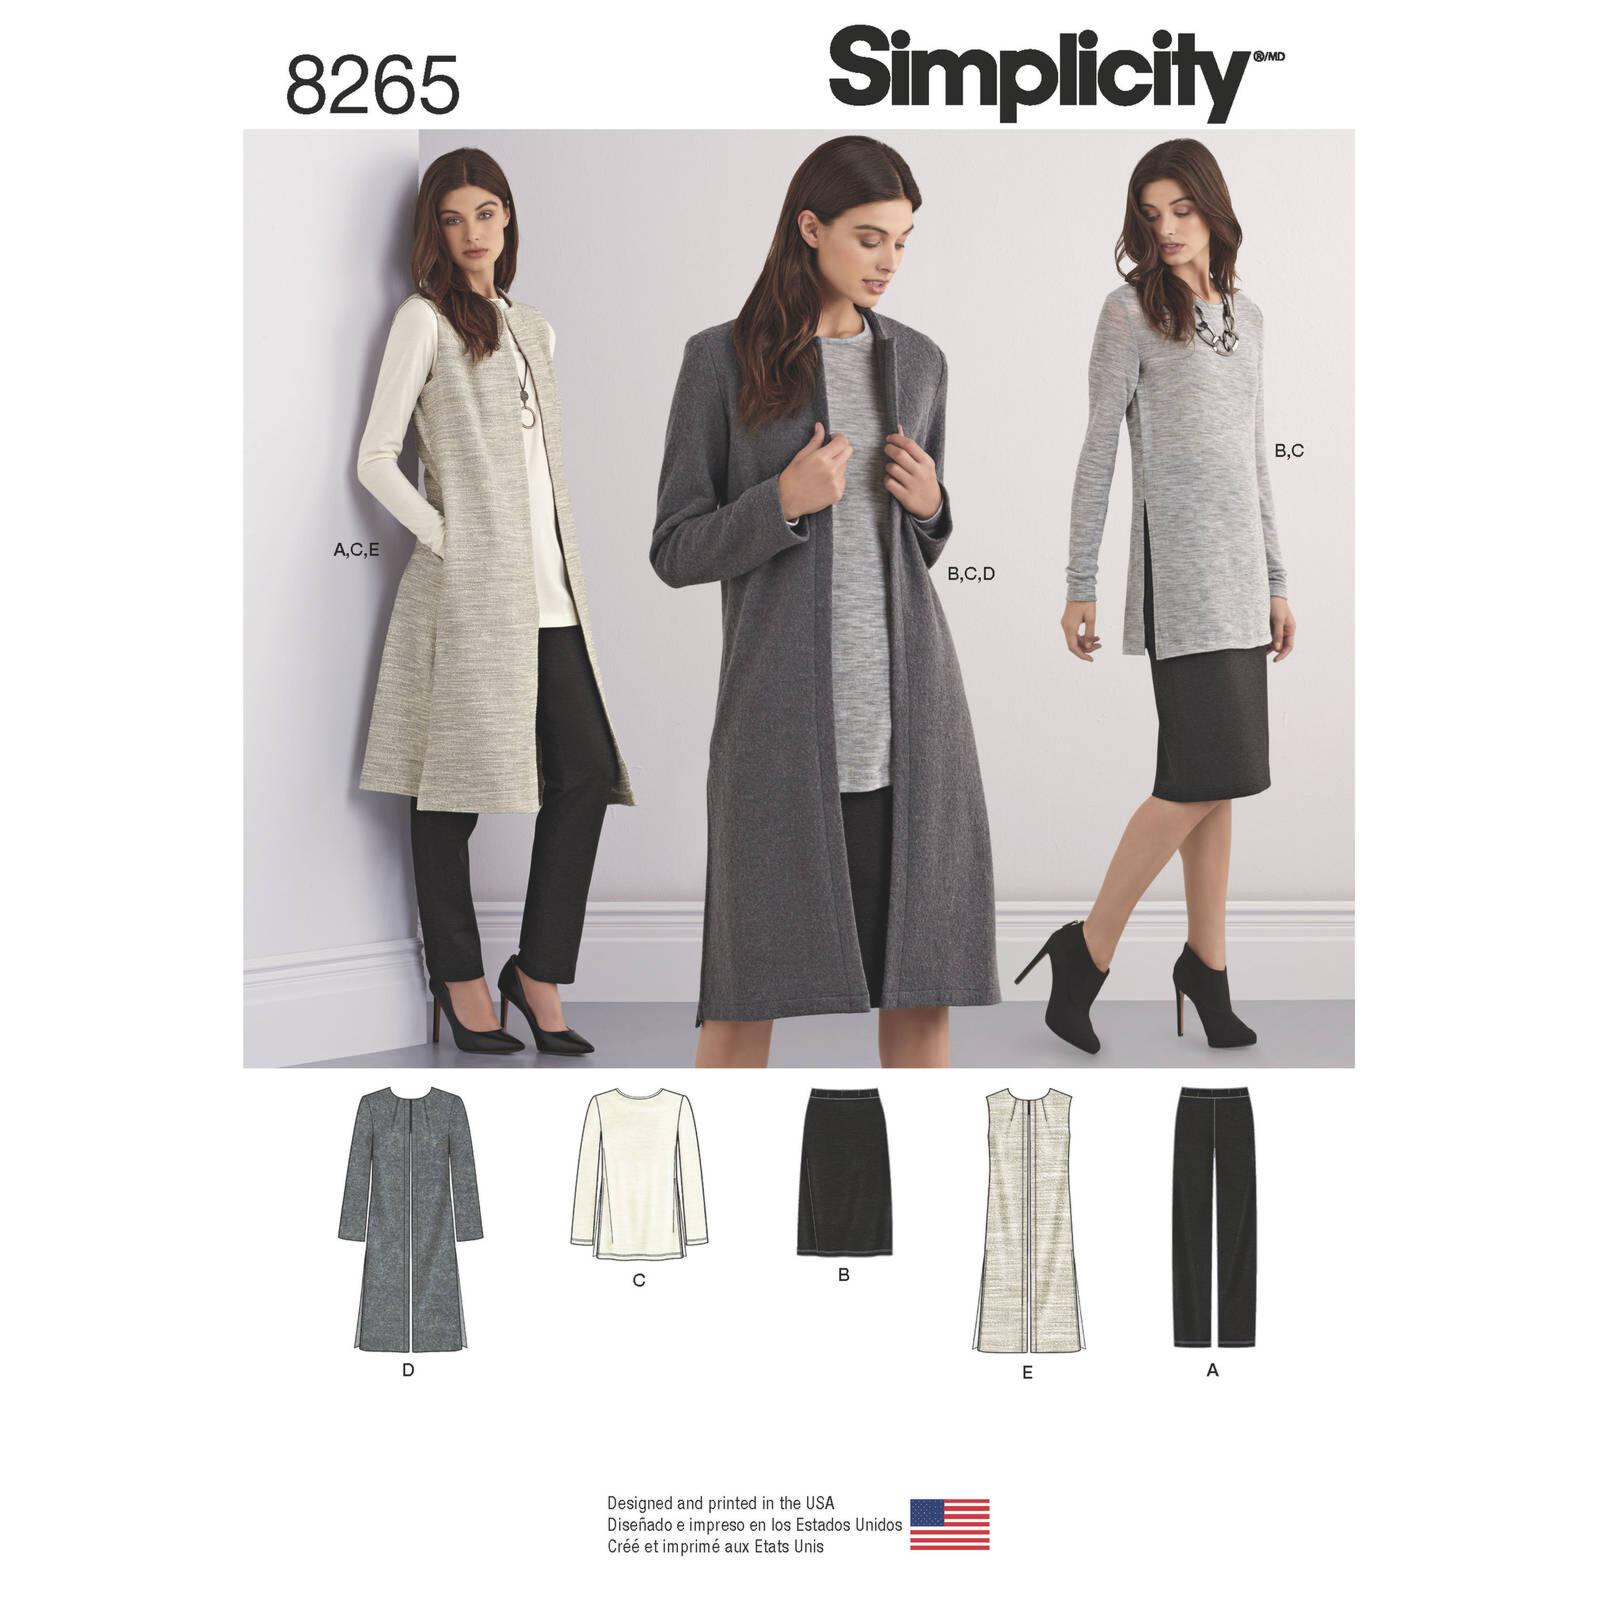 Simplicity - 8265